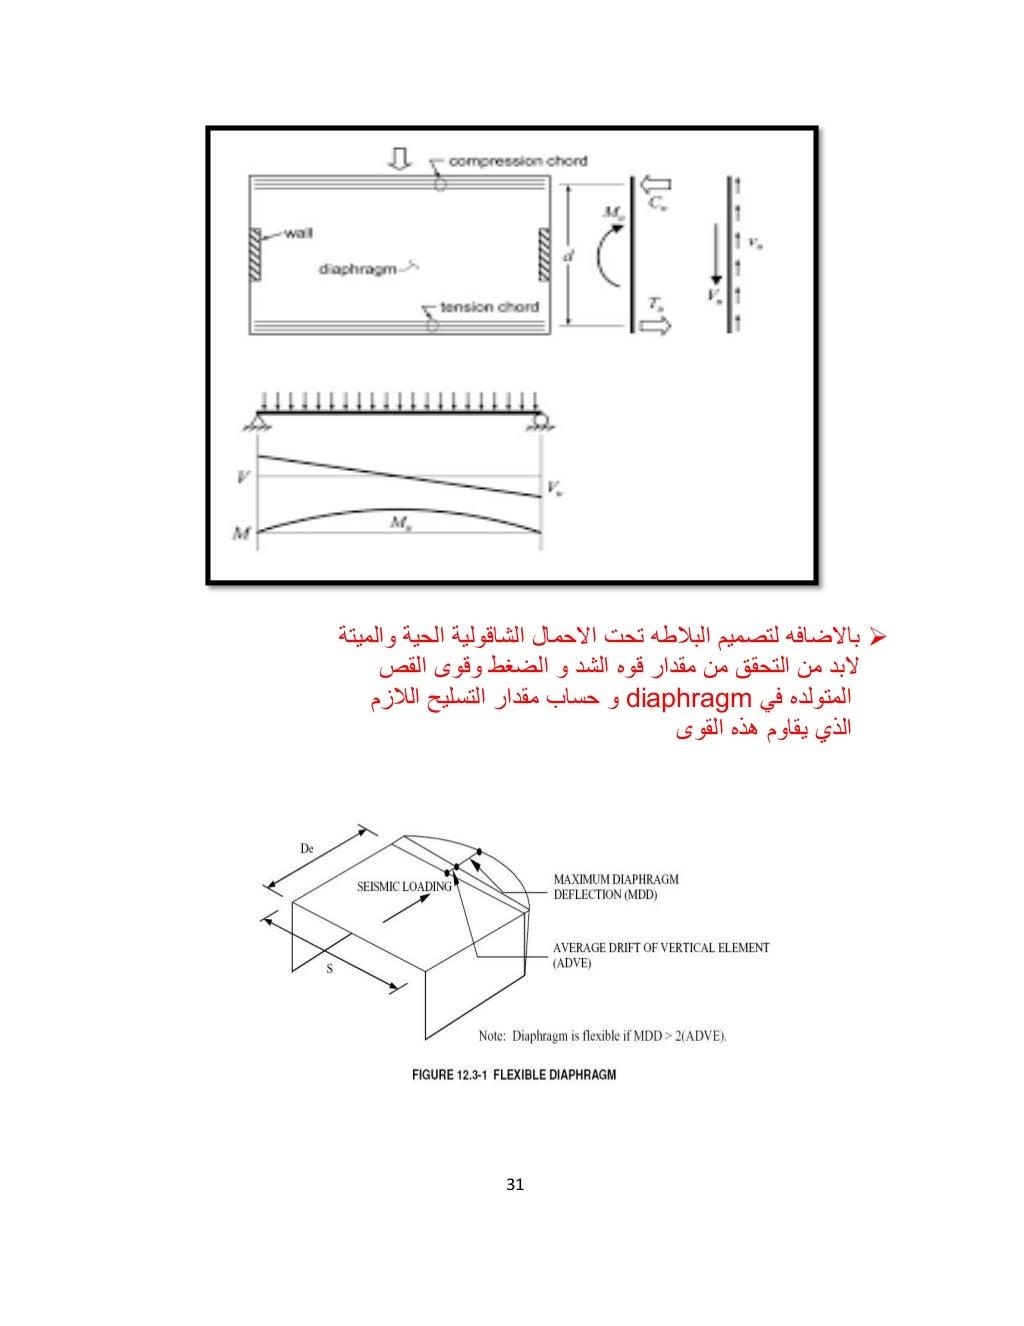 rigid-semi-rigid-flexible-diaphragm-for-seismic-analysis-31-1024.jpg